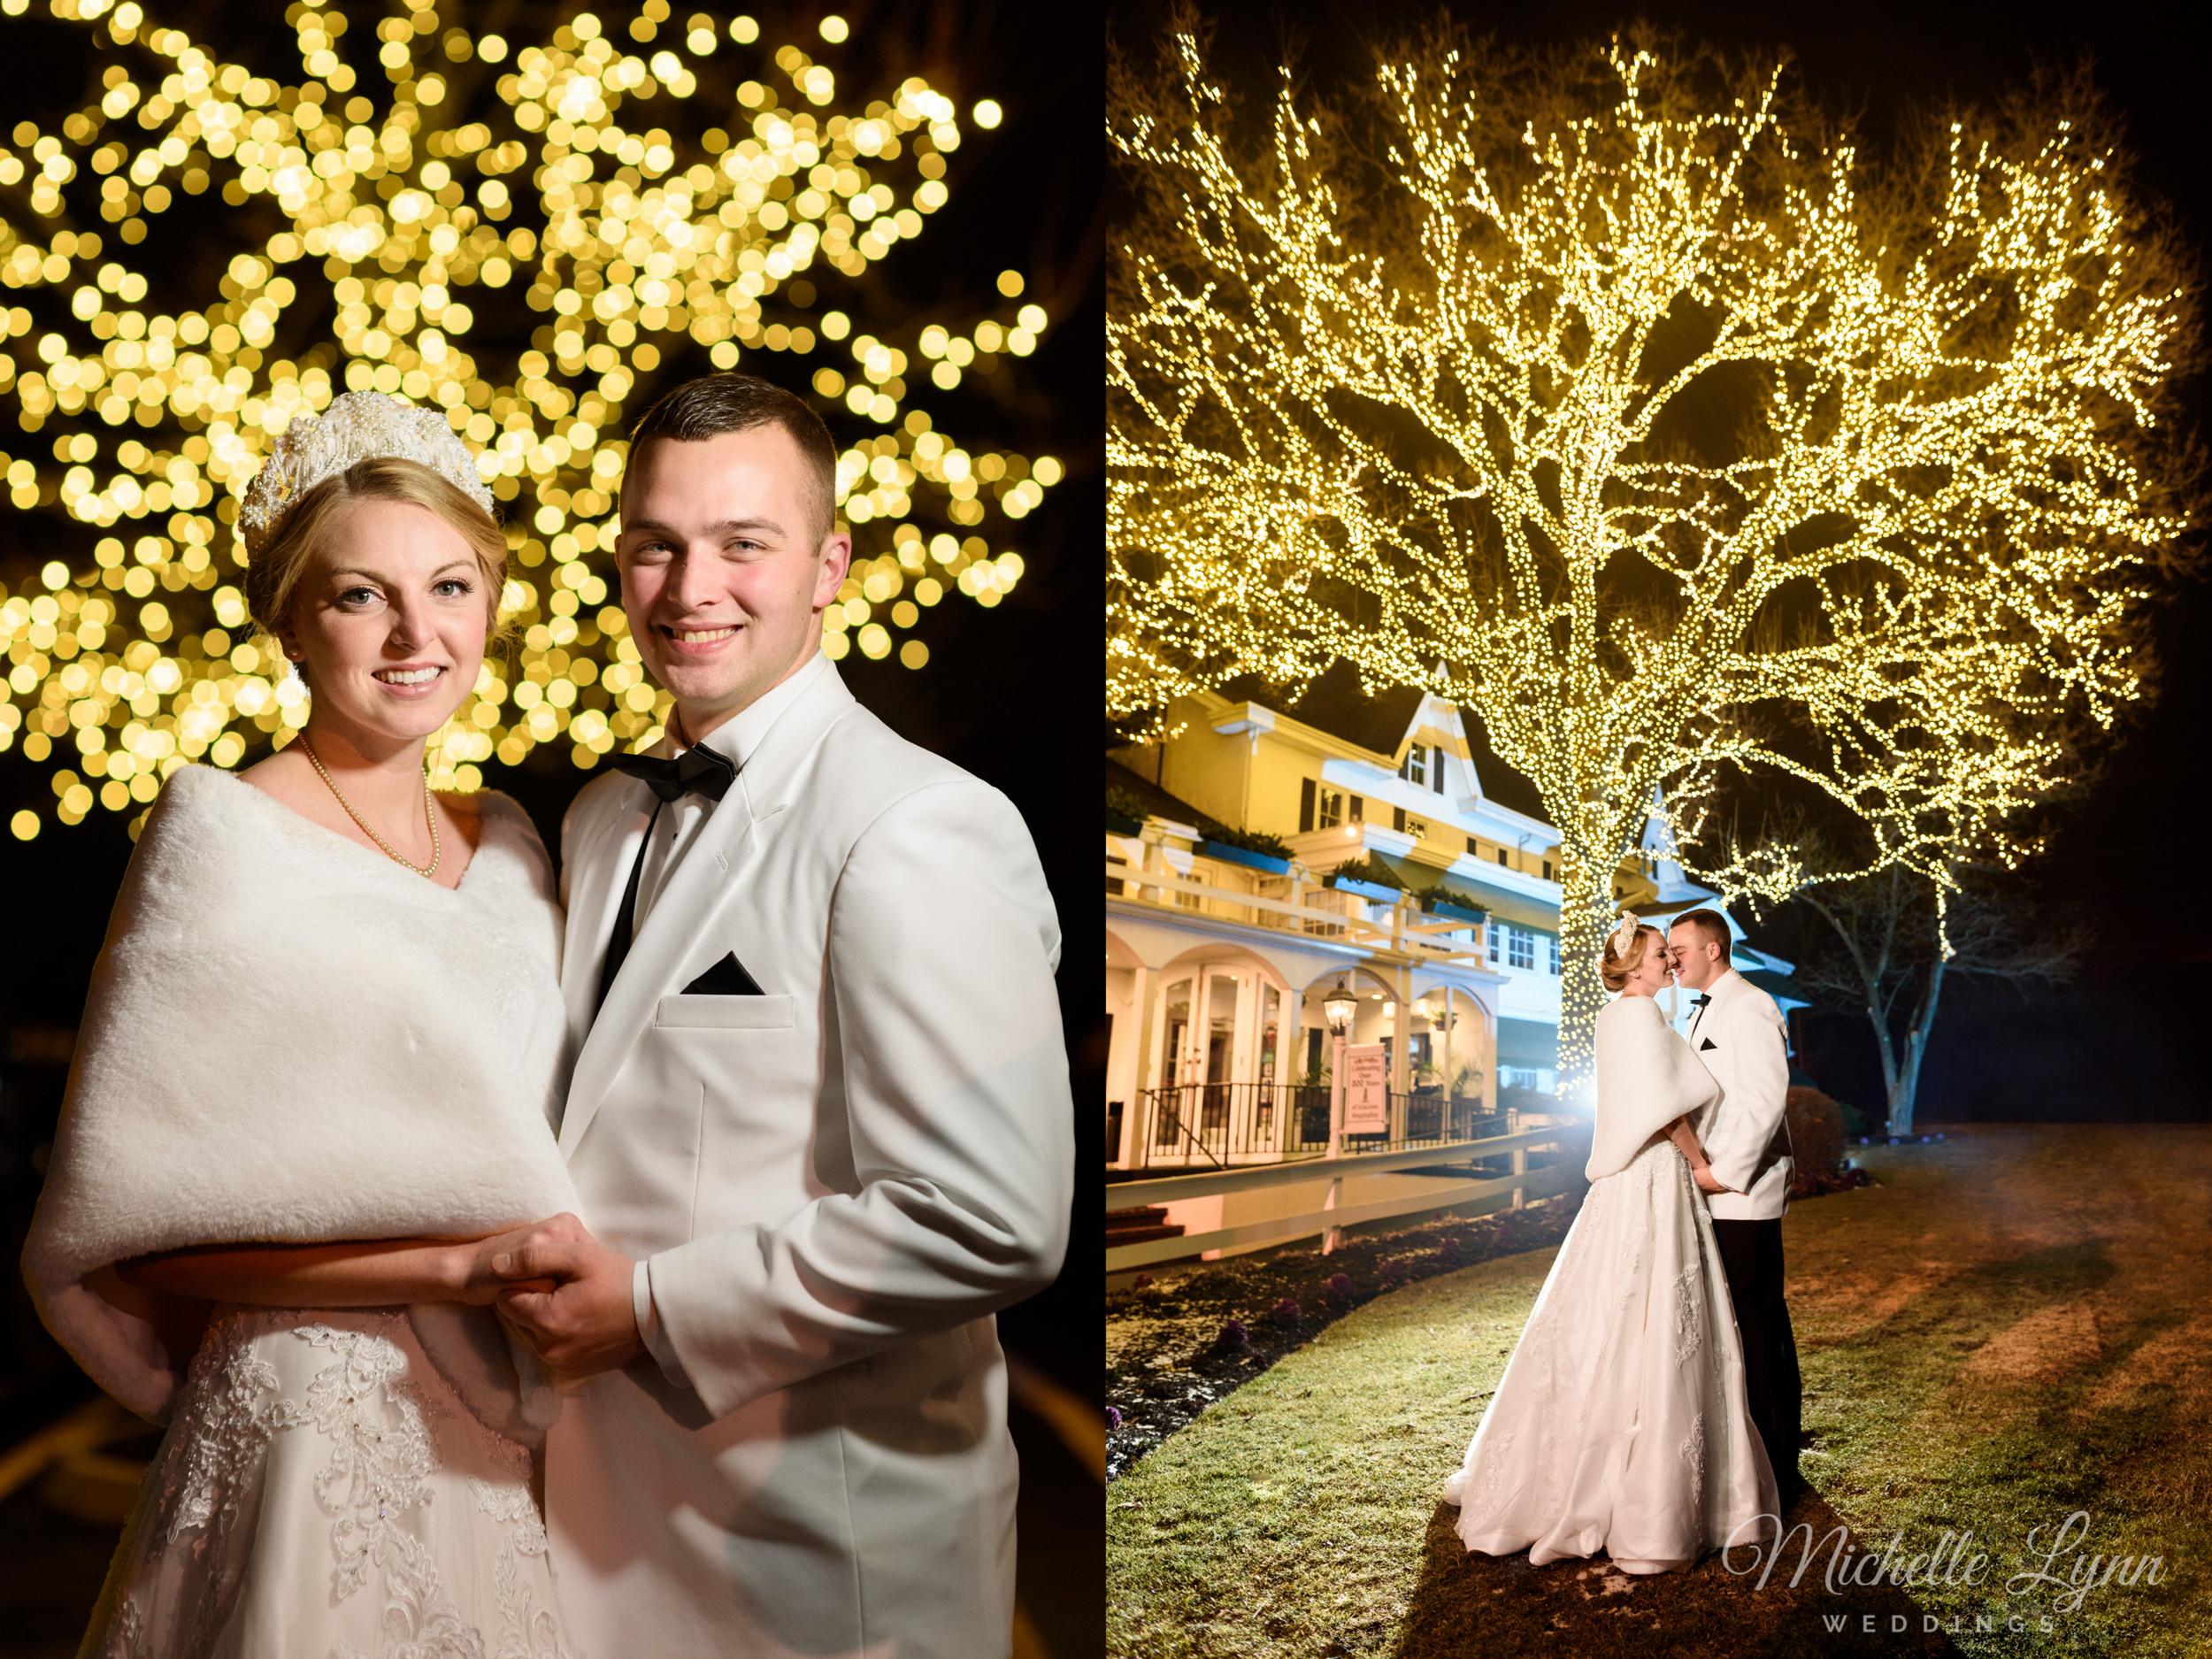 william-penn-inn-wedding-photography-mlw-126.jpg